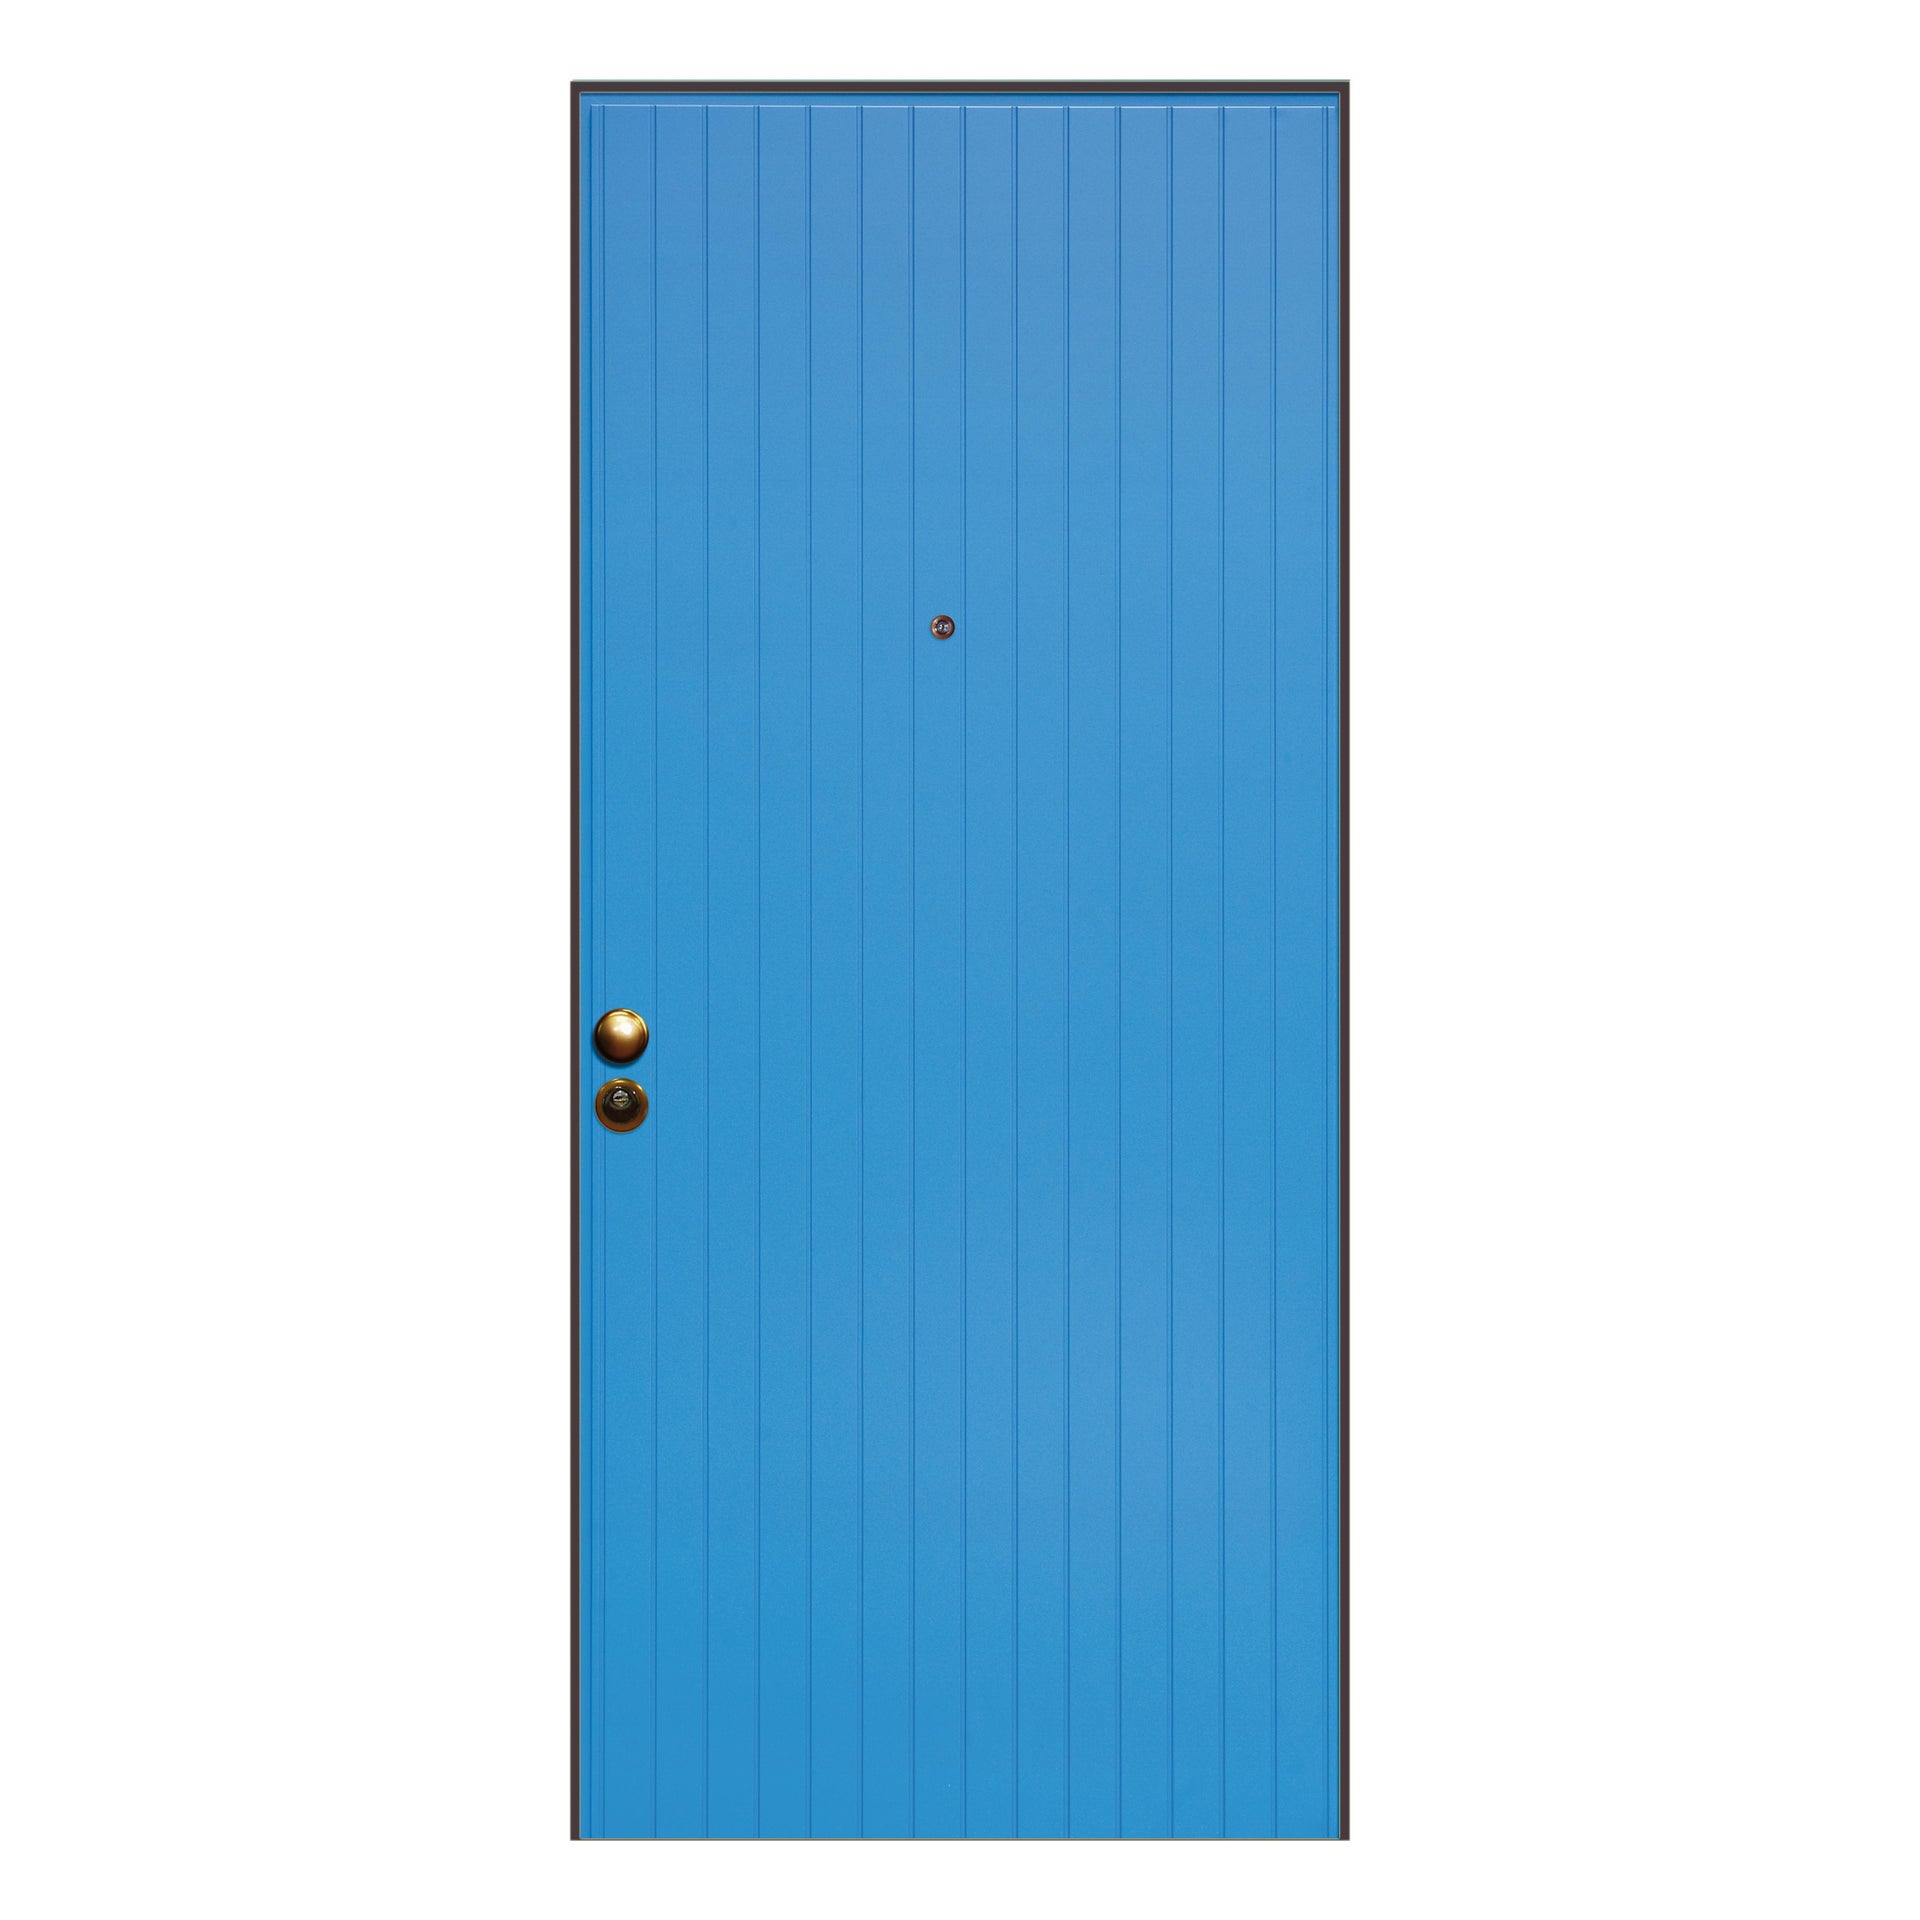 Porta blindata Grecia azzurro L 90 x H 210 cm destra - 4